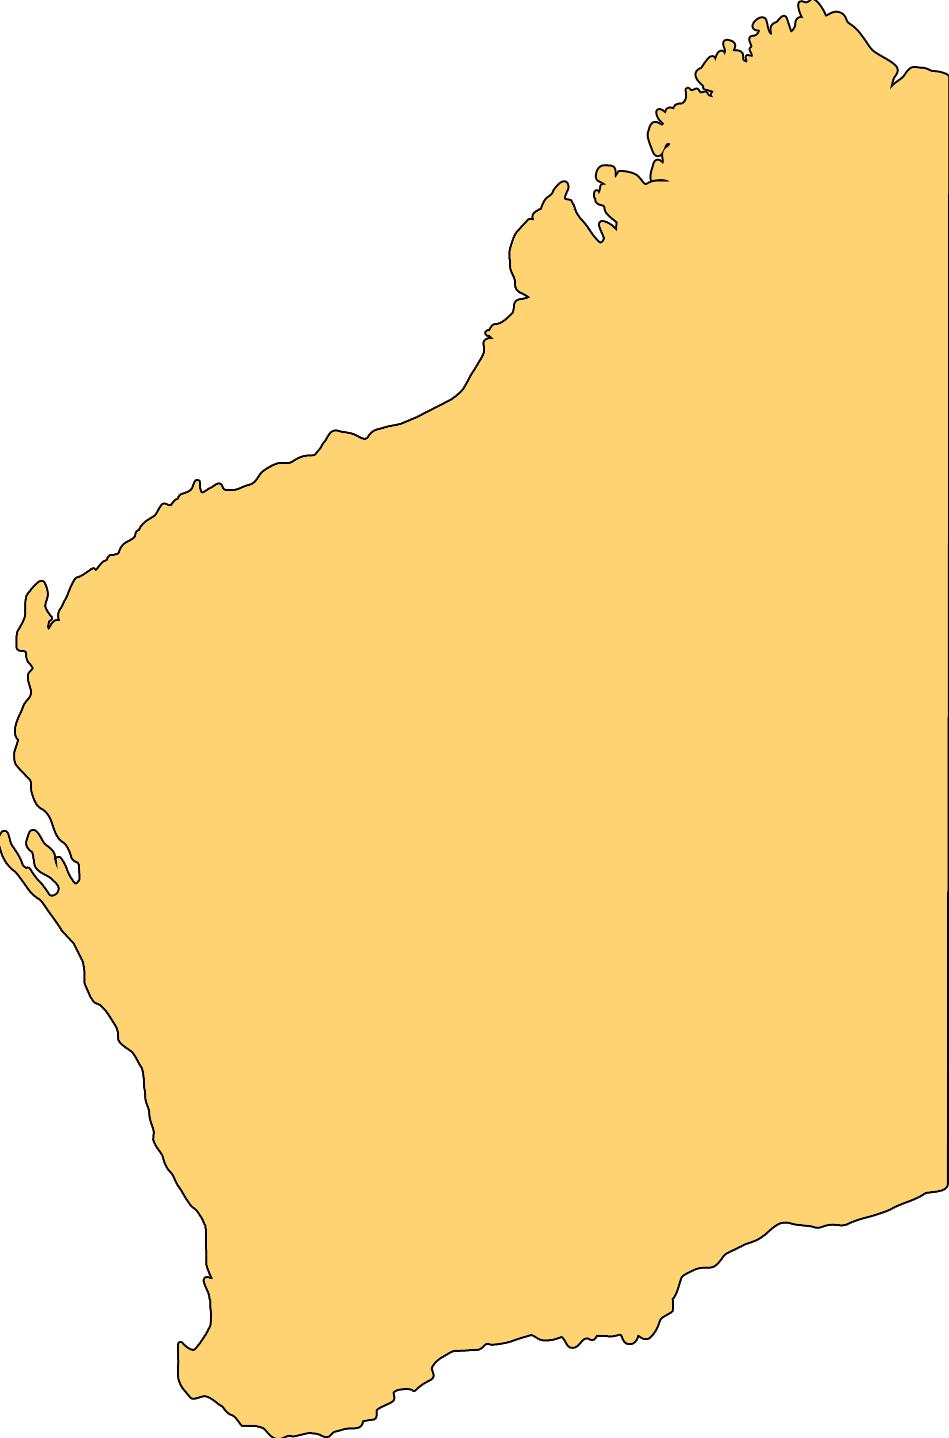 West Australia Clipart Clipground - Empty map of australia